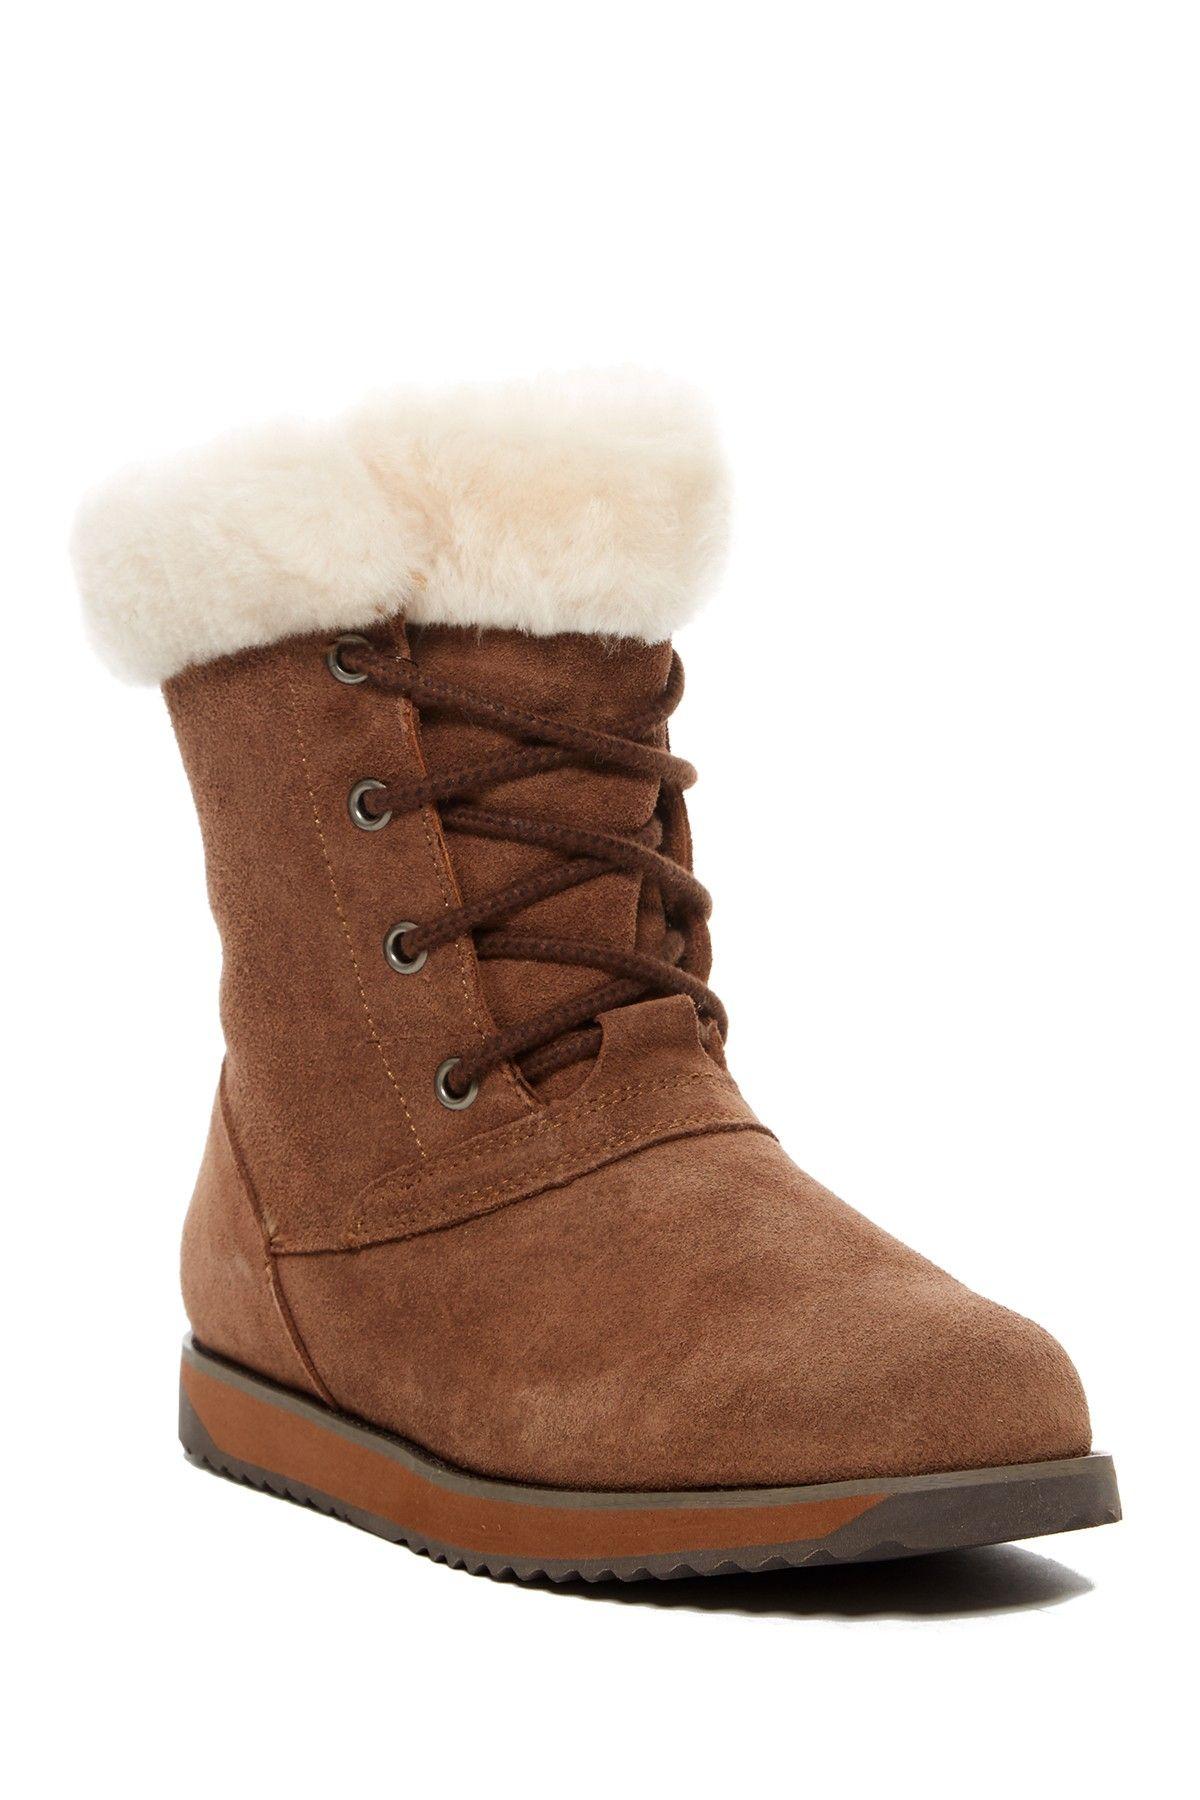 c5fd1a6352c EMU Australia | Shaw Lo Genuine Sheep Fur Lace-Up Boot | Products ...